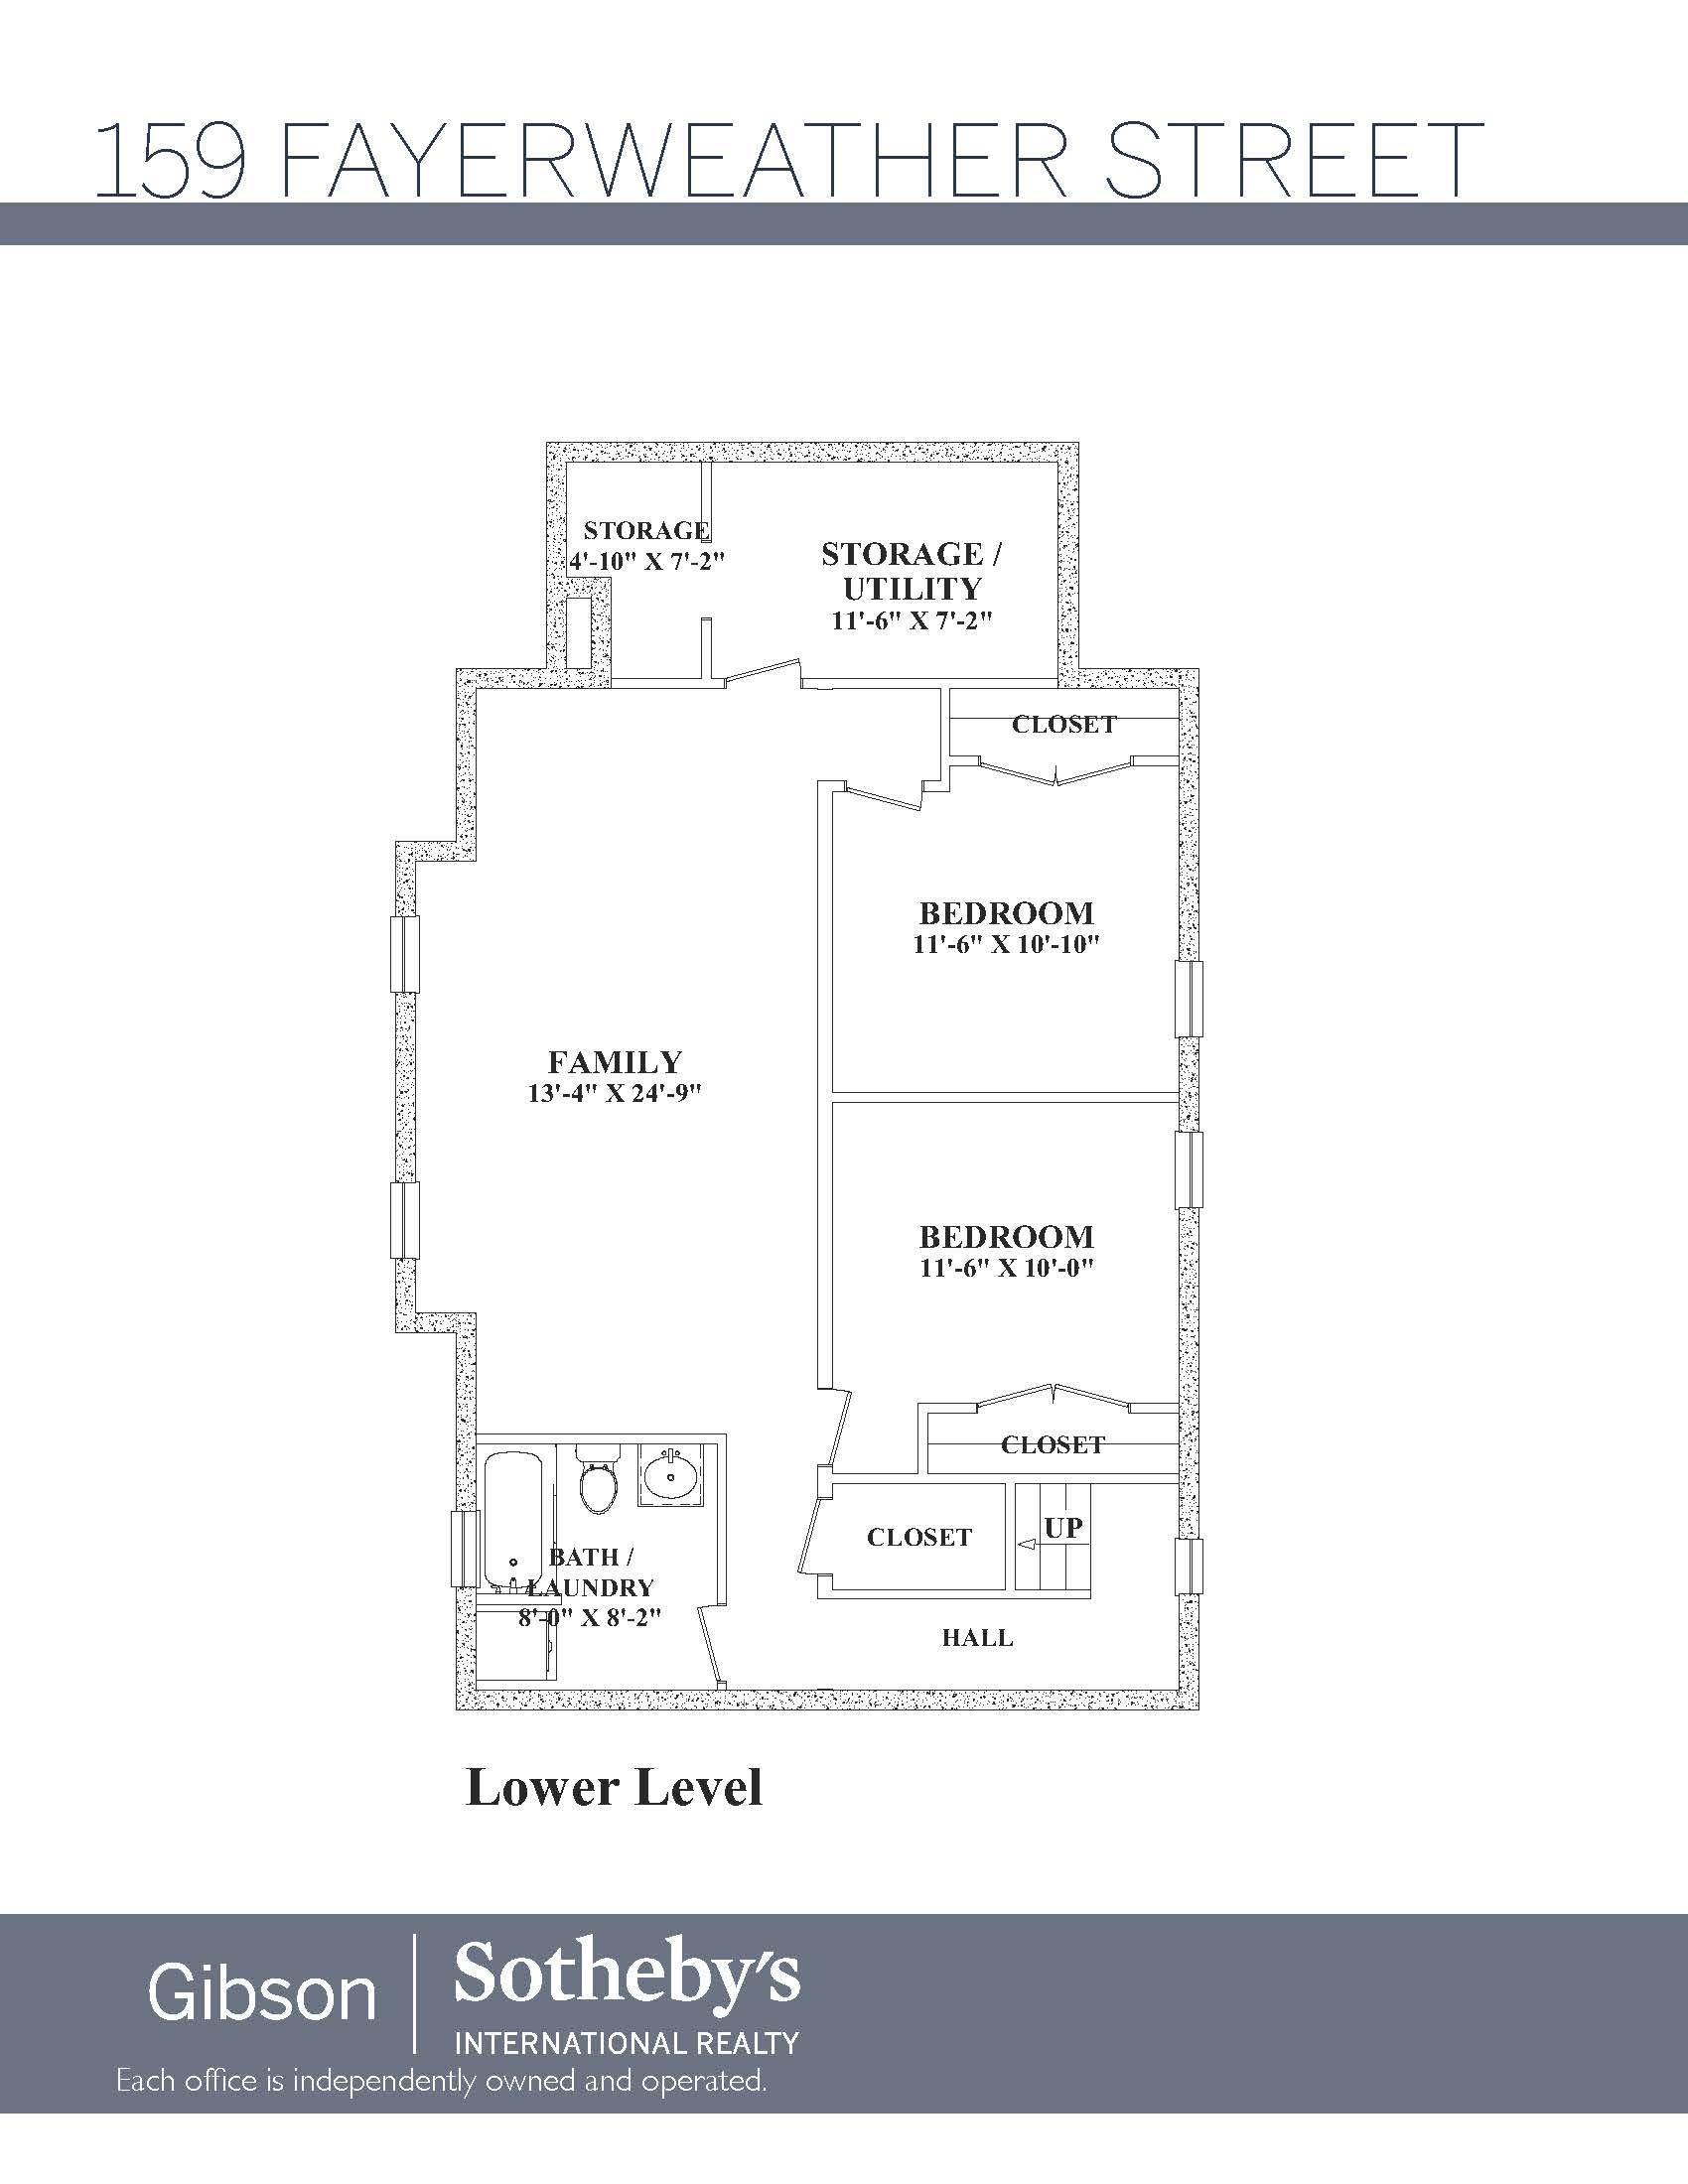 159 Fayerweather Street Branded Floor Plans for Website_Page_2.jpg